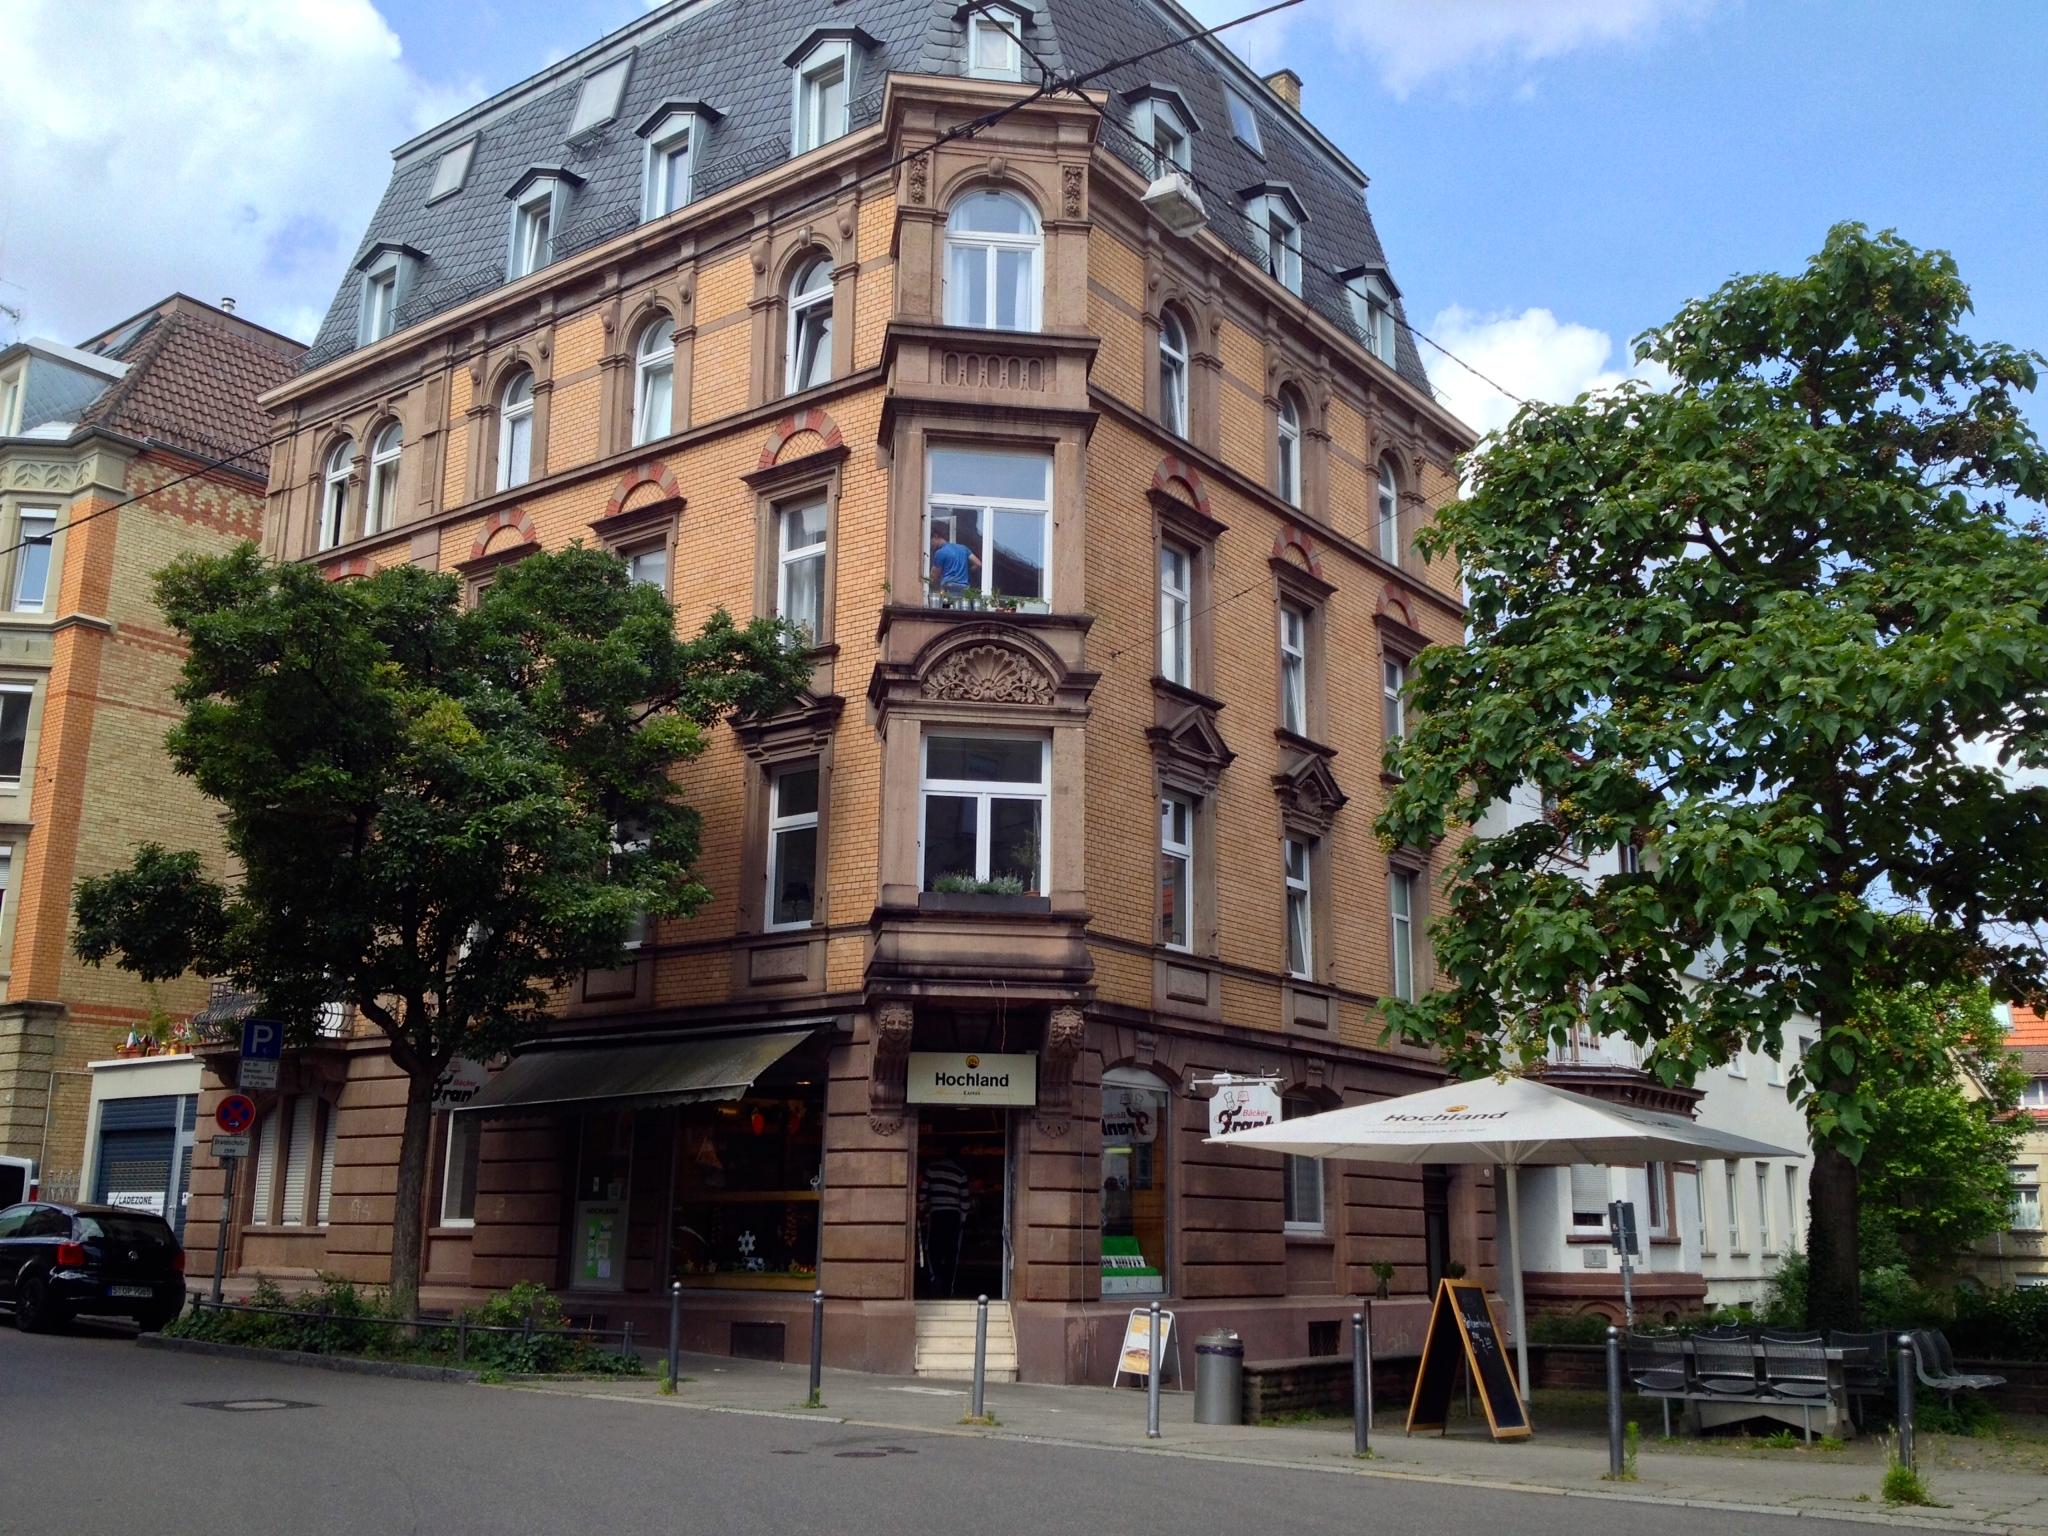 The outside of the Wächterstraße location